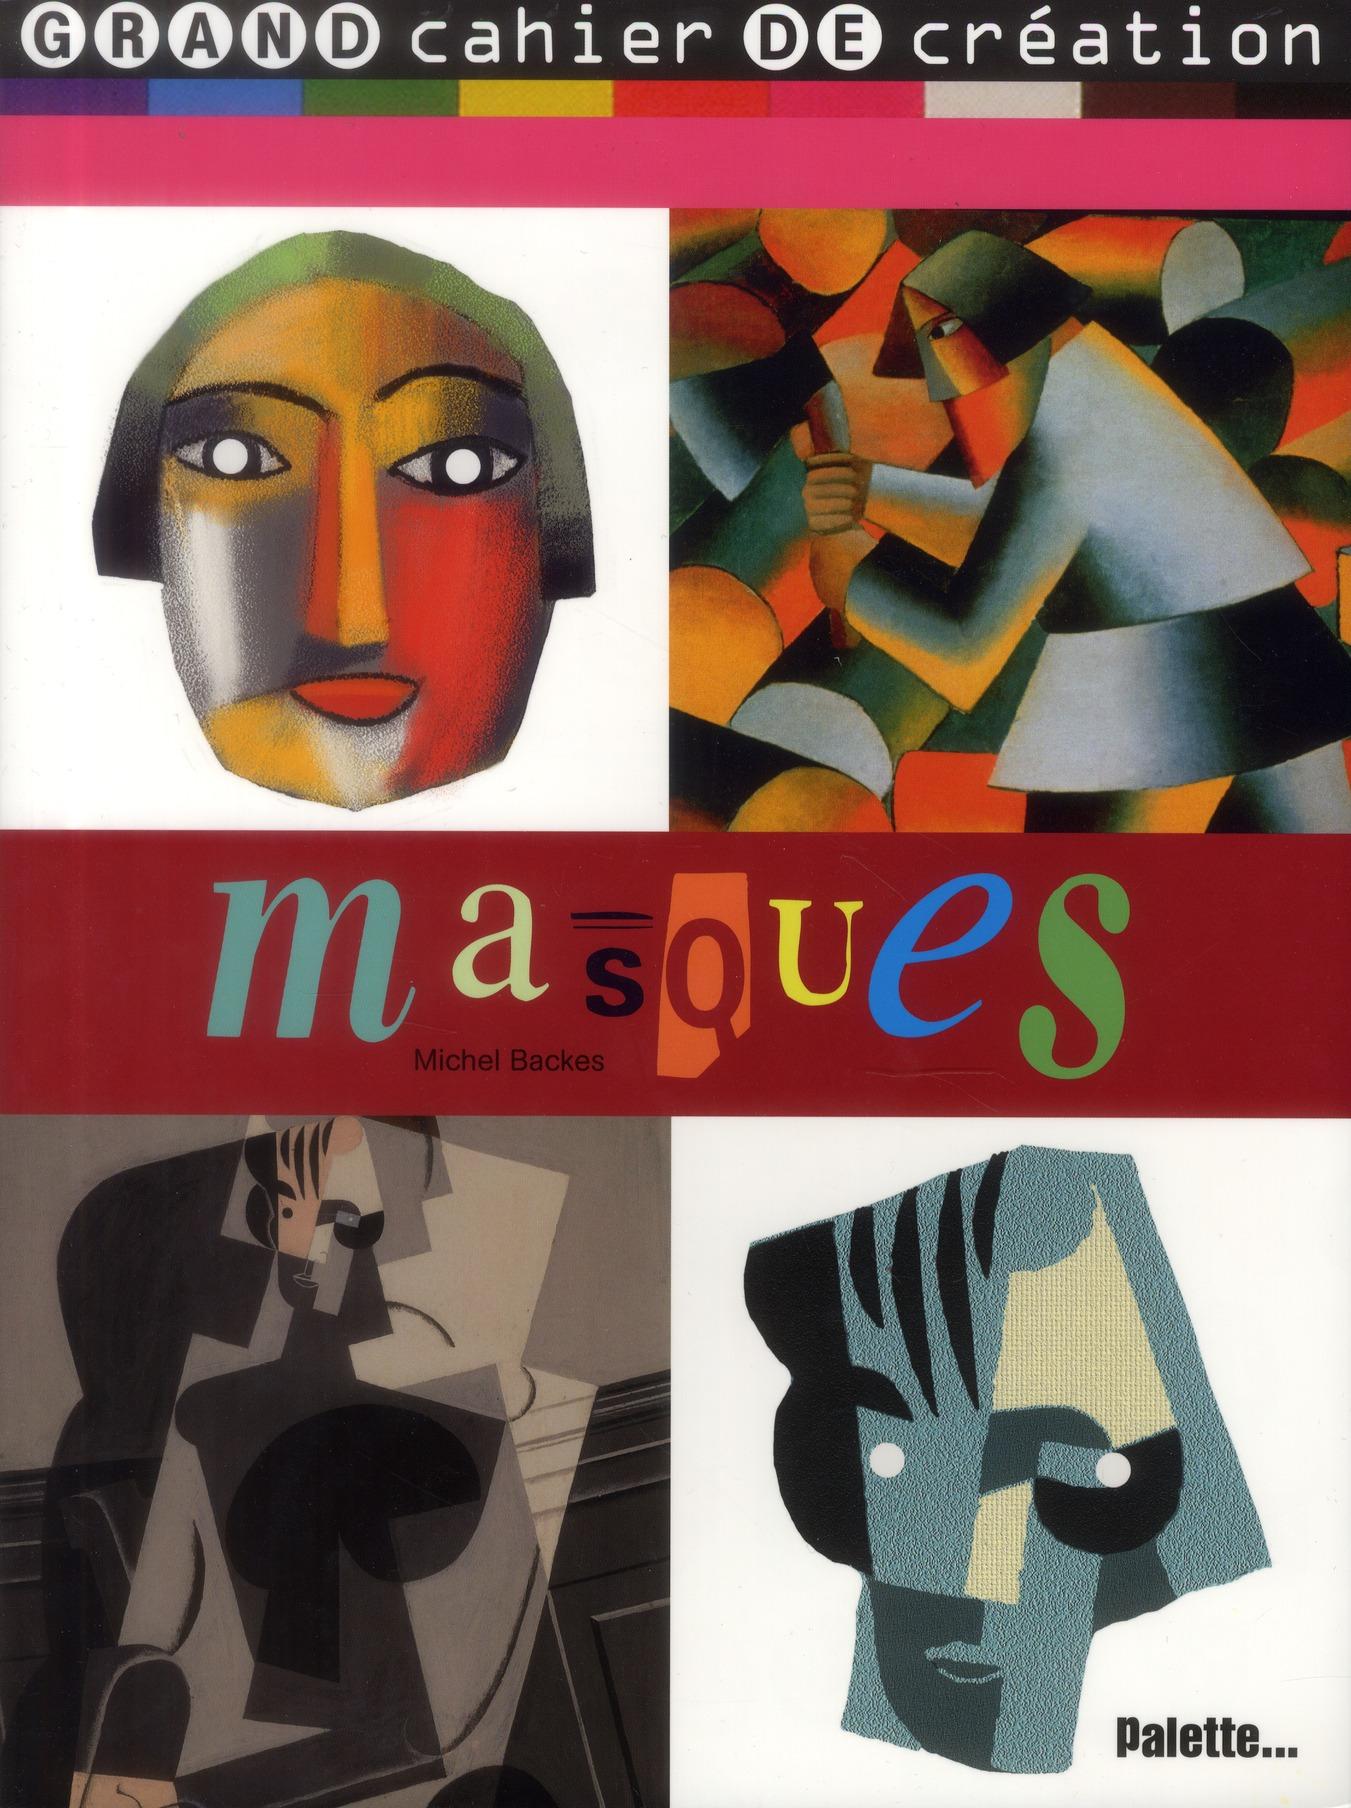 MASQUES - GRAND CAHIER DE CREATION